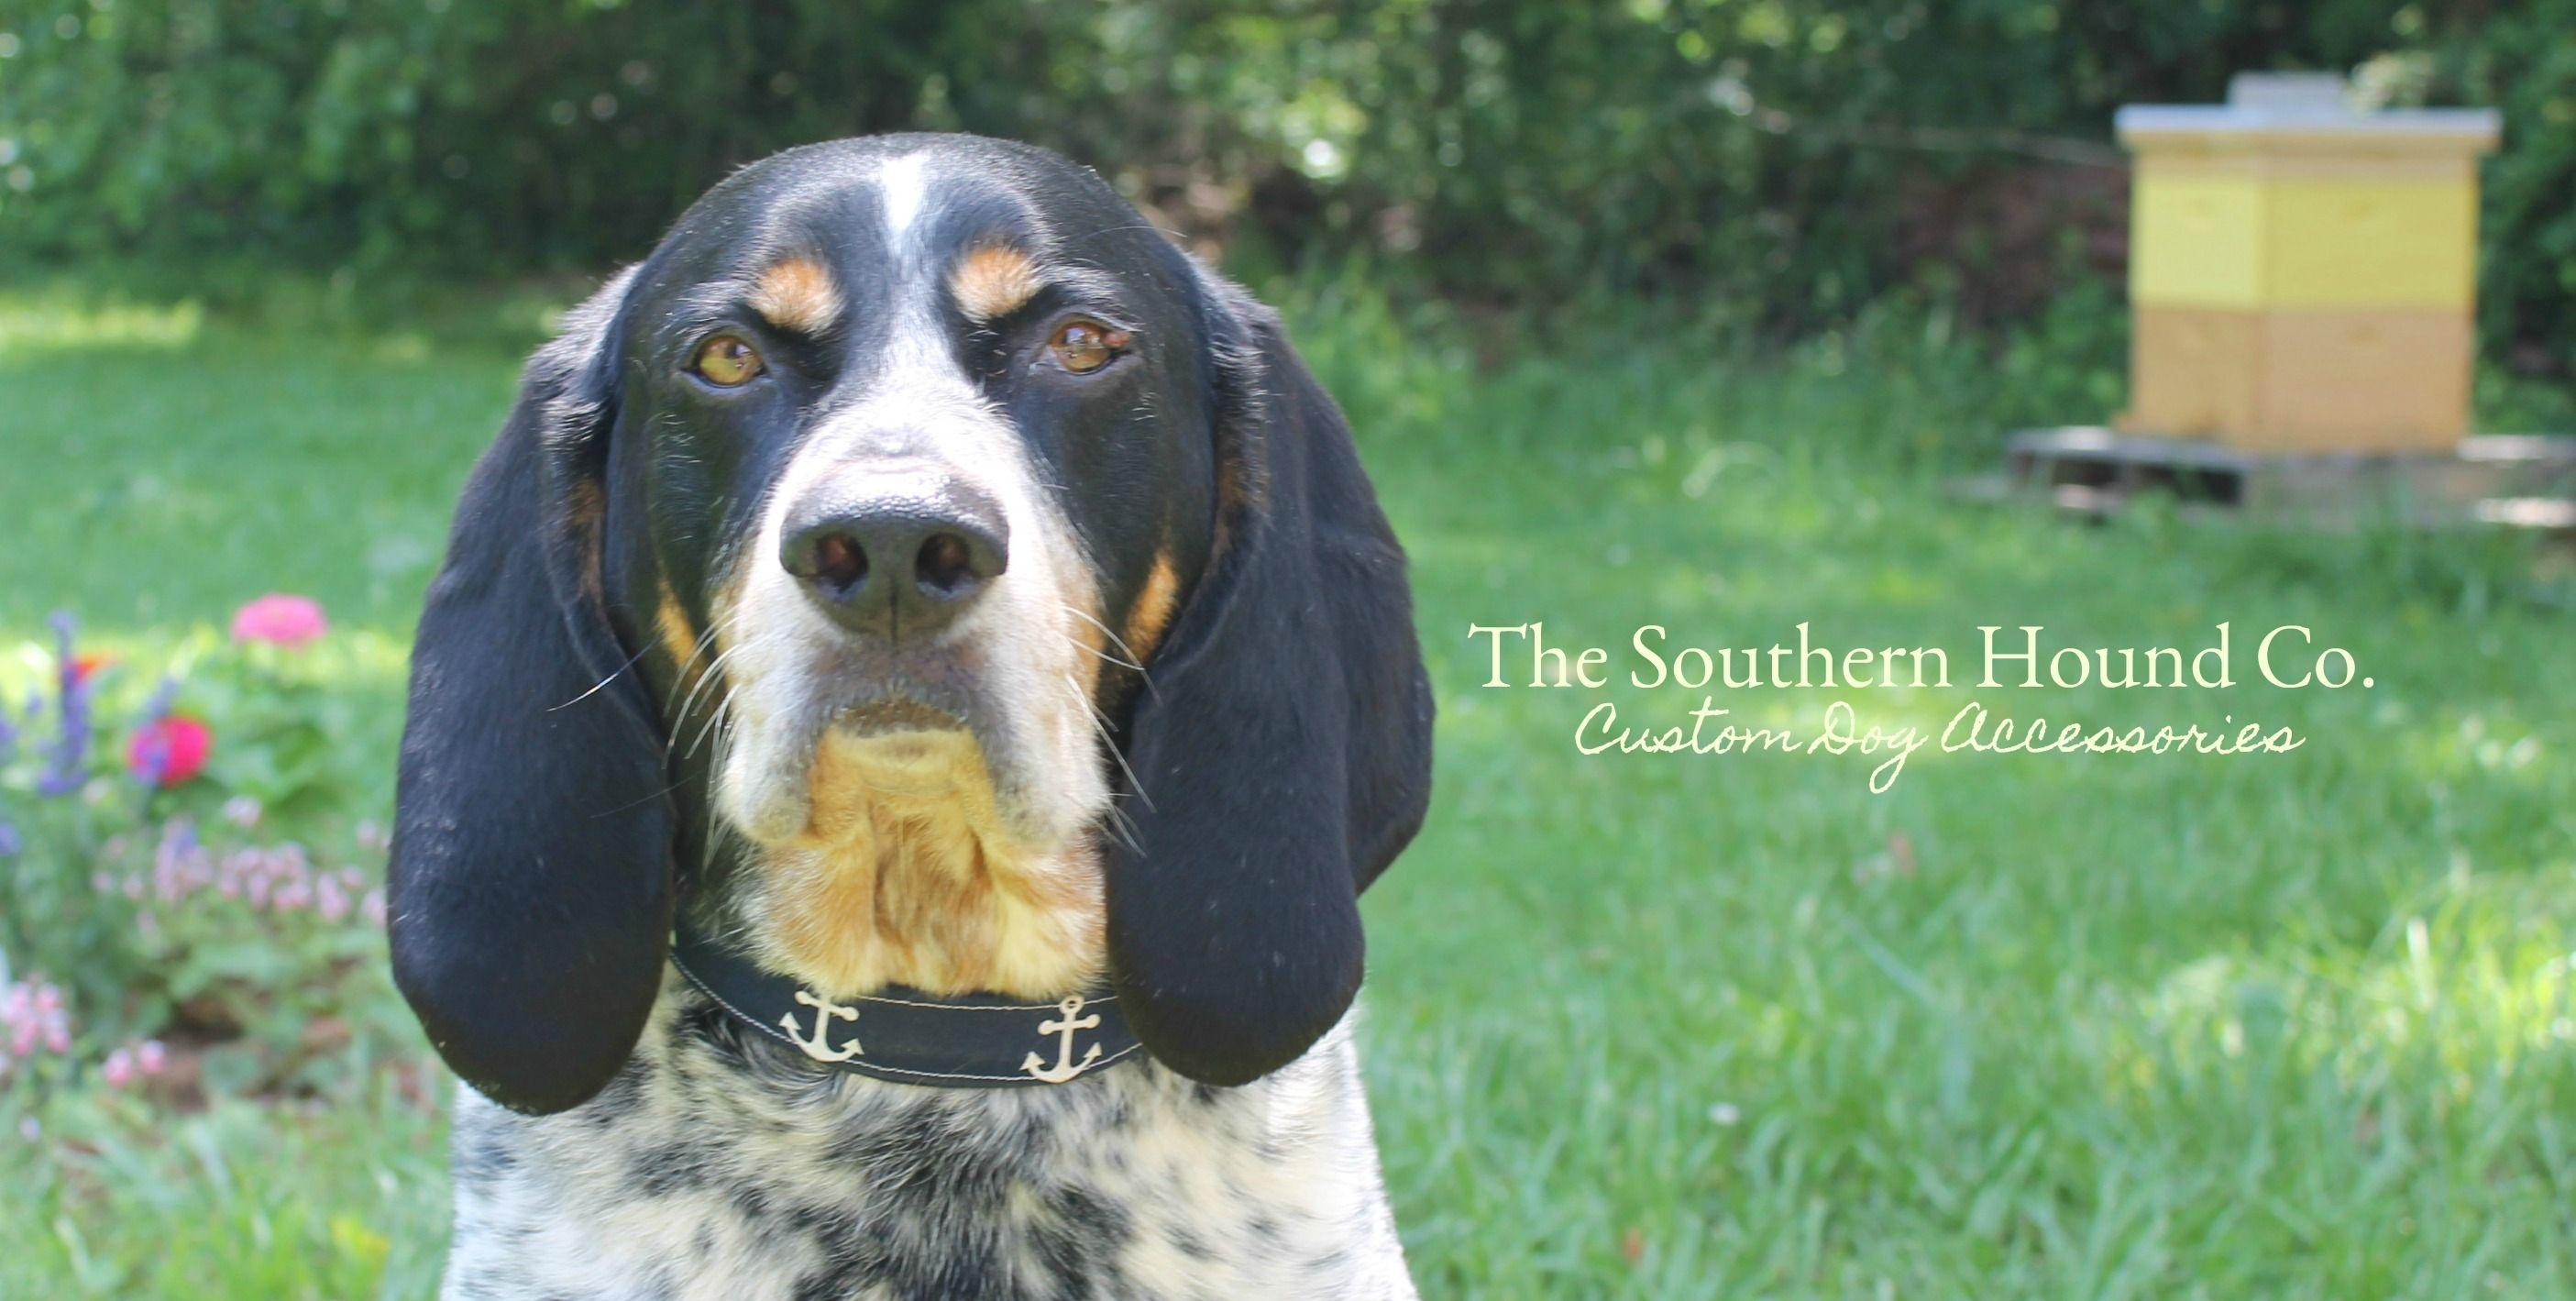 The Southern Hound Co Creates Custom Handmade Dog Accessories We